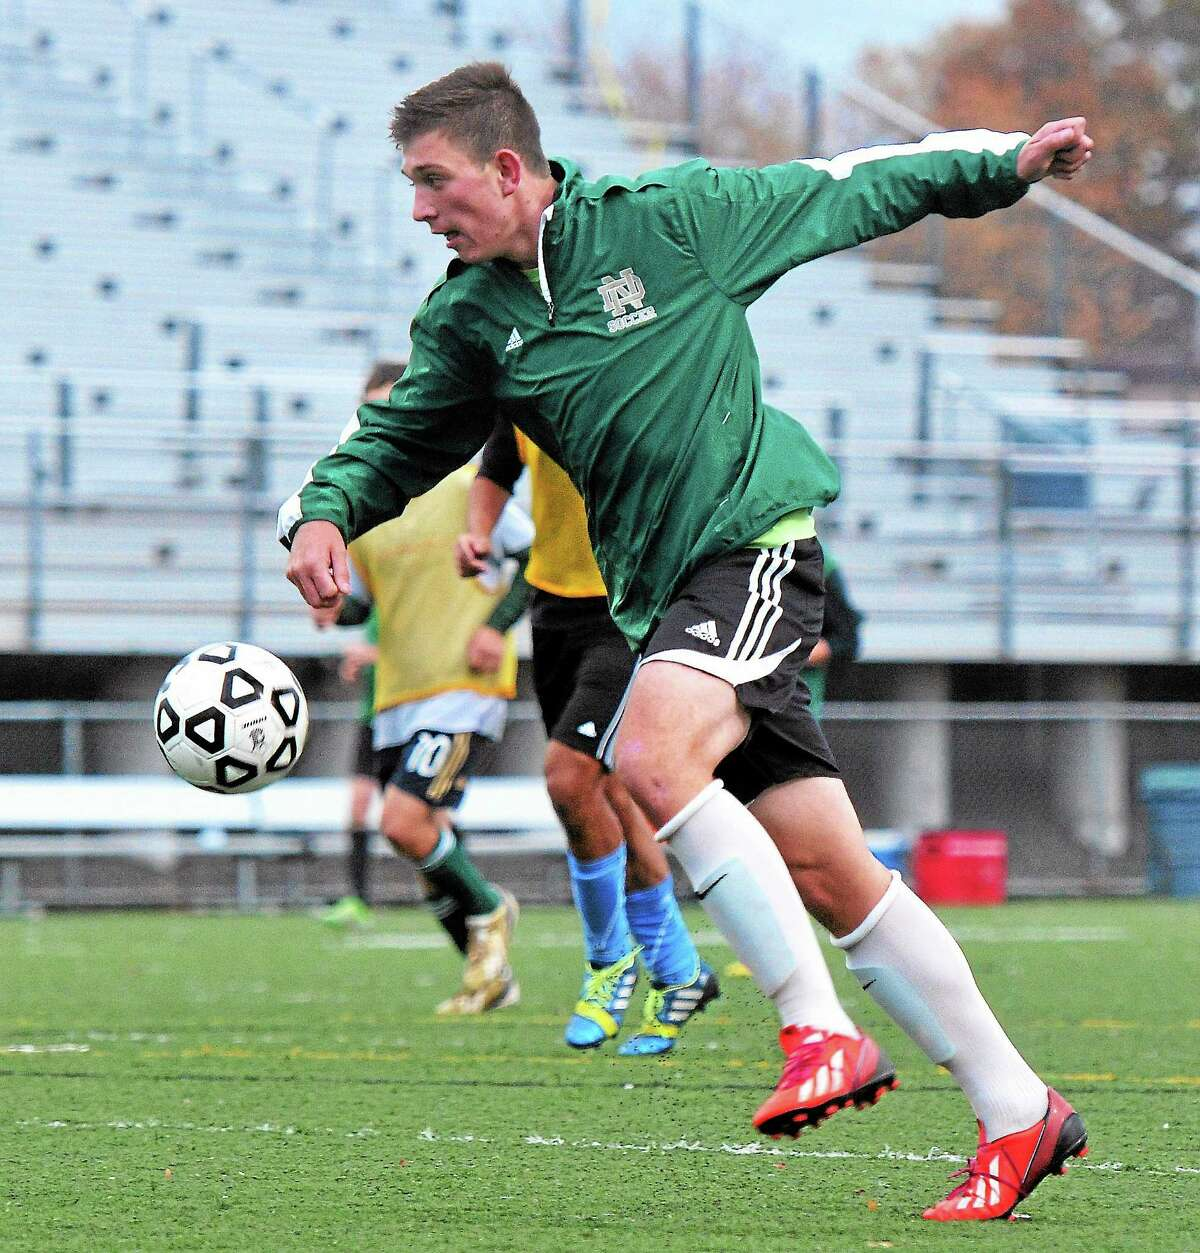 Notre Dame-West Haven sophomore Alex Mathews earned All-SCC Quinnipiac Division honors this season.